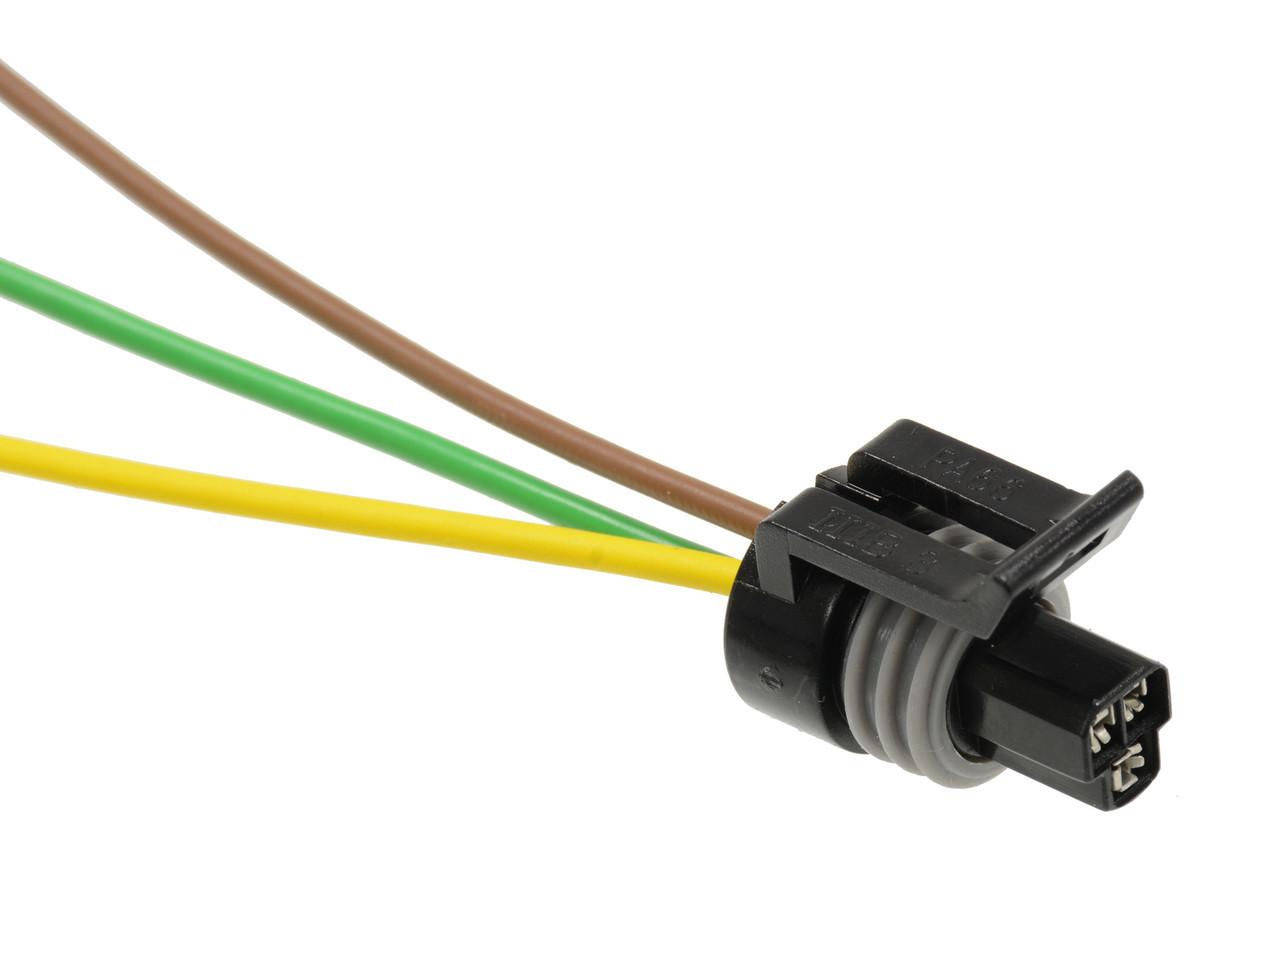 LS1 Coolant Temperature Temp Sensor Connector Harness 3 Wire Fits GM